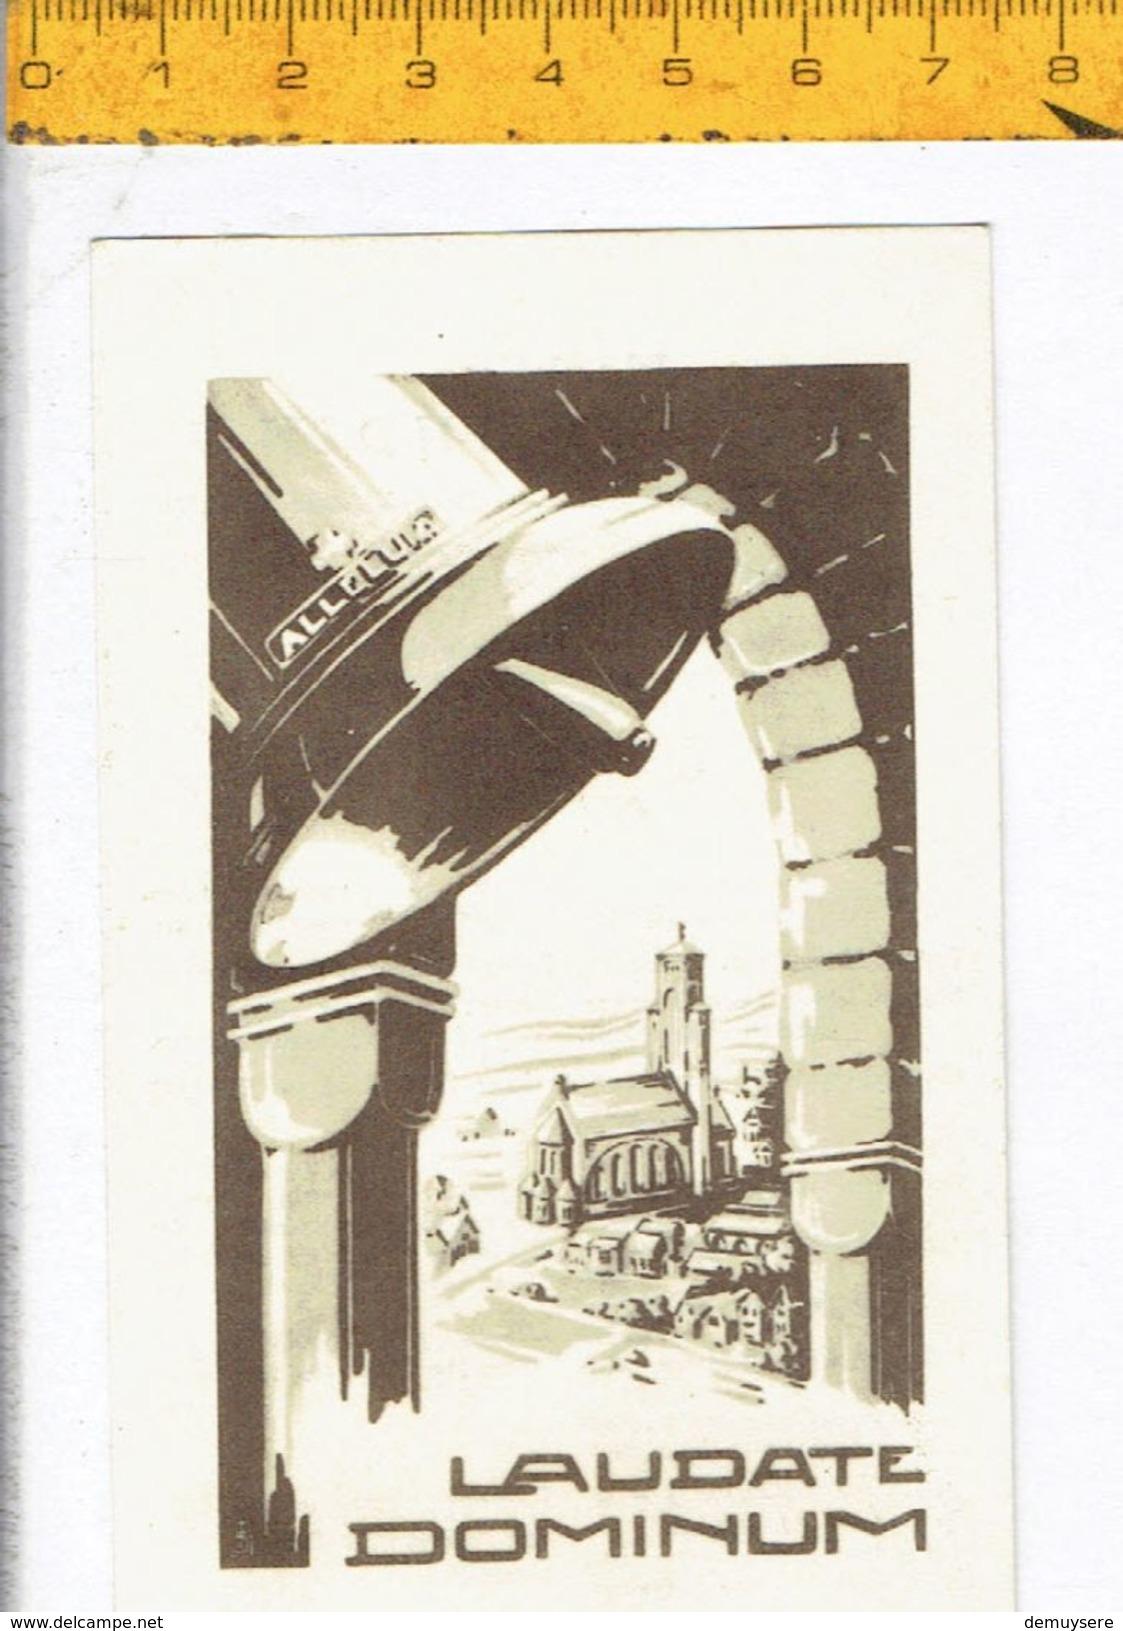 Kl 044 - Klokkenwijding 1952 Sint Gillis Waas - Maria Toon Re 1760 Kgr; - Egidius Toon Fa Dieze 1000 Kgr - Religion & Esotérisme